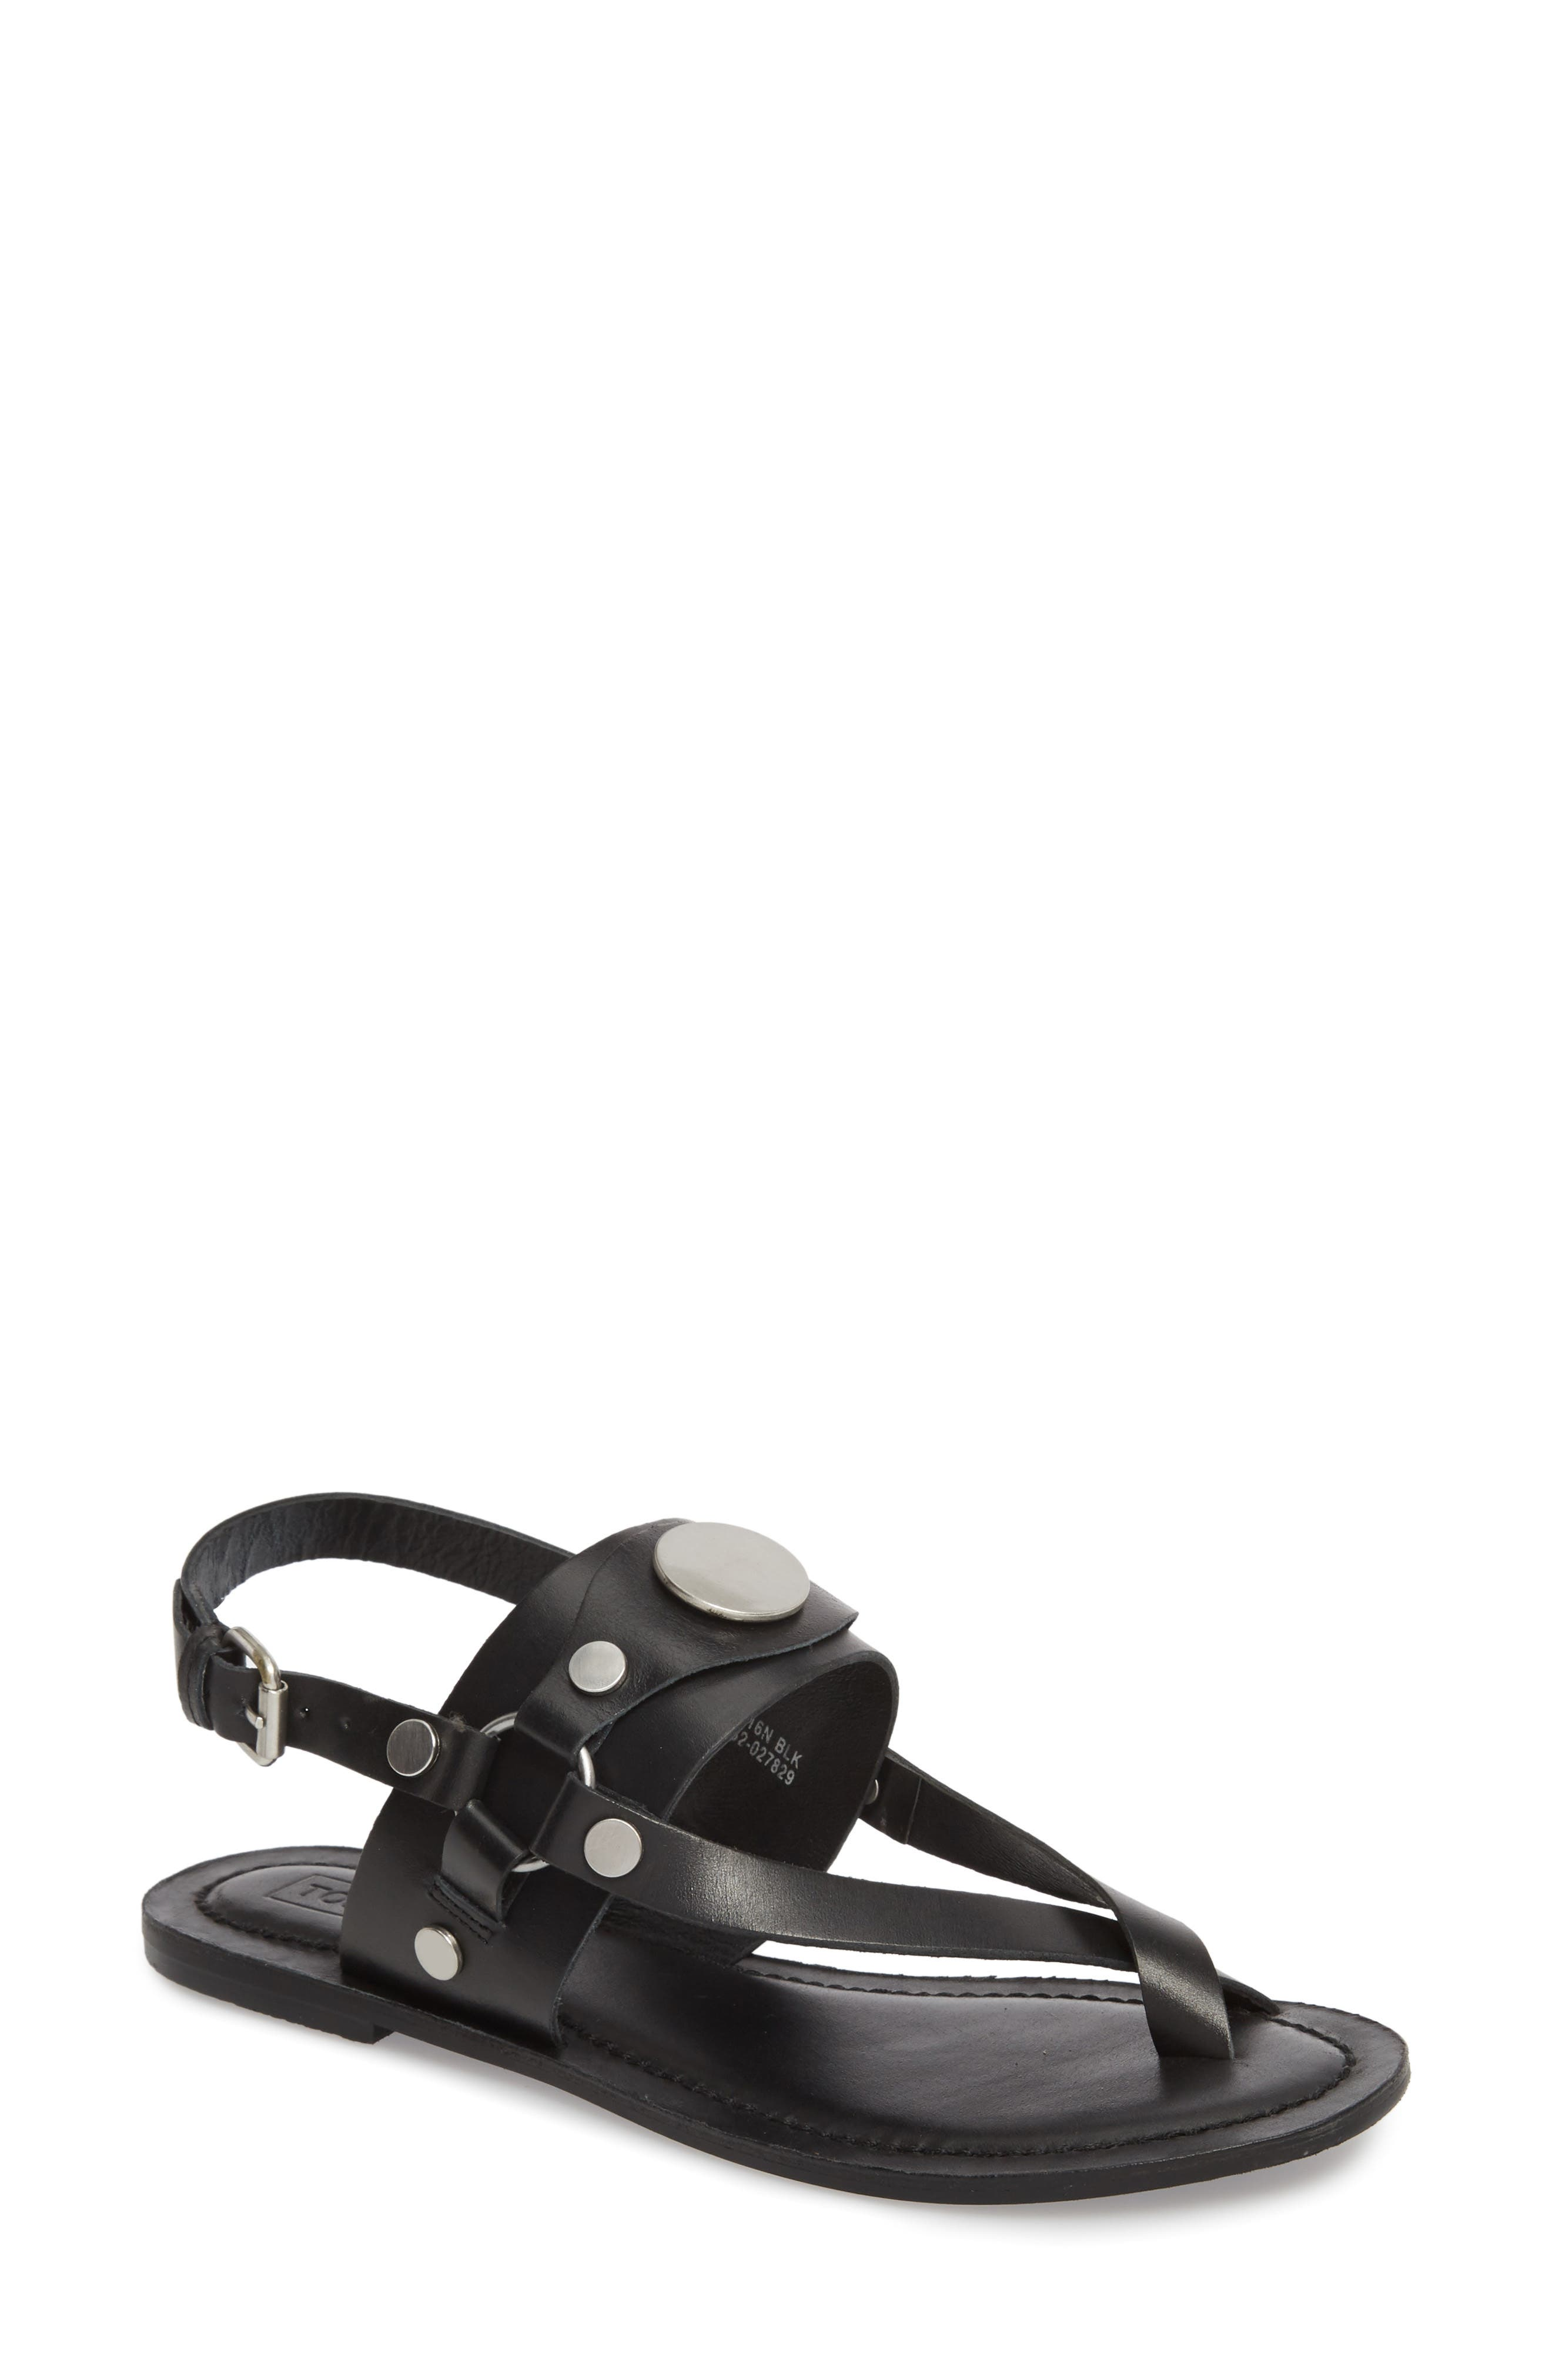 Fate Sandal,                         Main,                         color, Black Multi